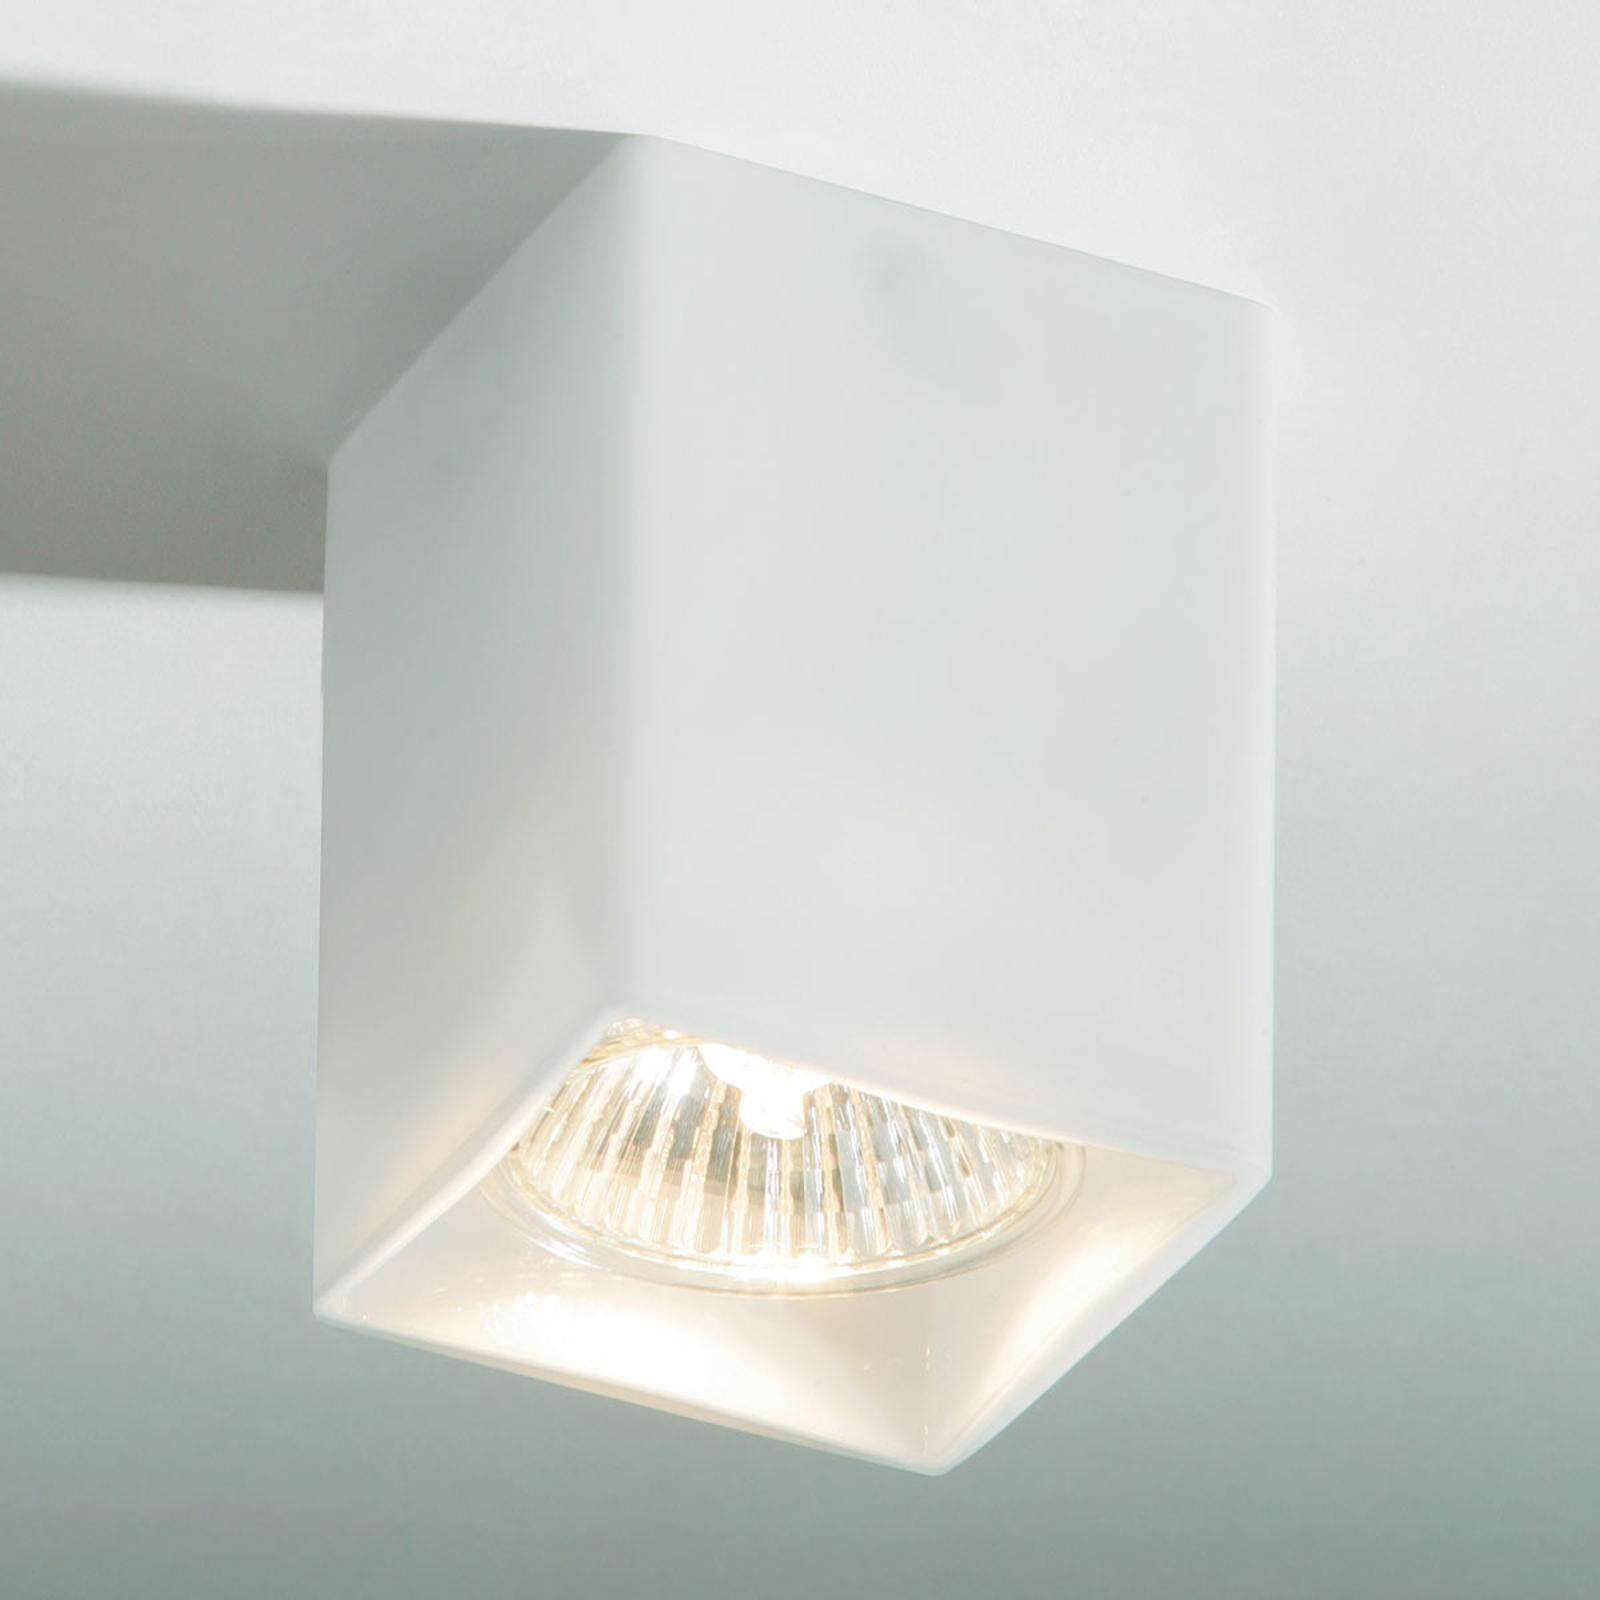 Hoekige plafondlamp QUADRO van wit glas